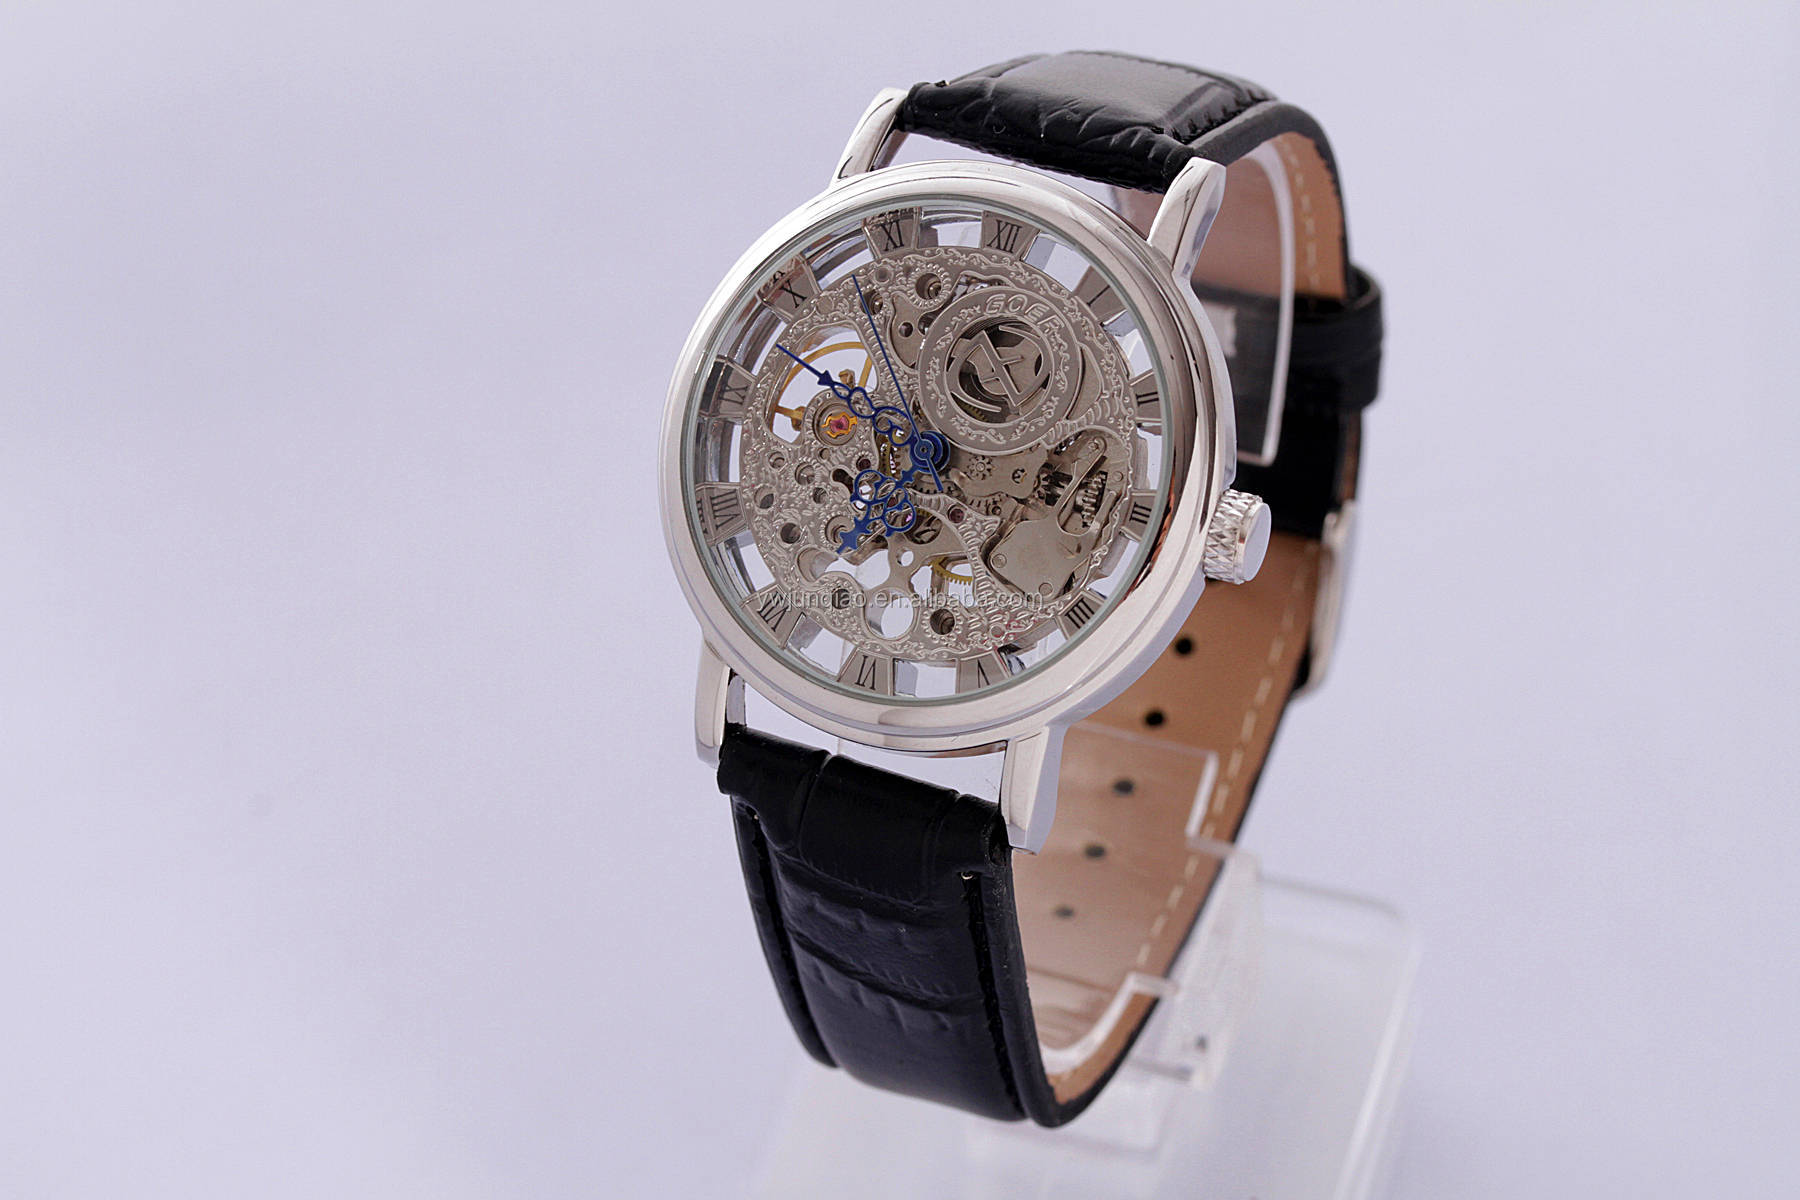 9a3701eefb0e9 الأسهم 3 ألوان الساعات الميكانيكية. حار بيع دليل هيكل عظمي الميكانيكية ووتش فضة  رجالي ساعة